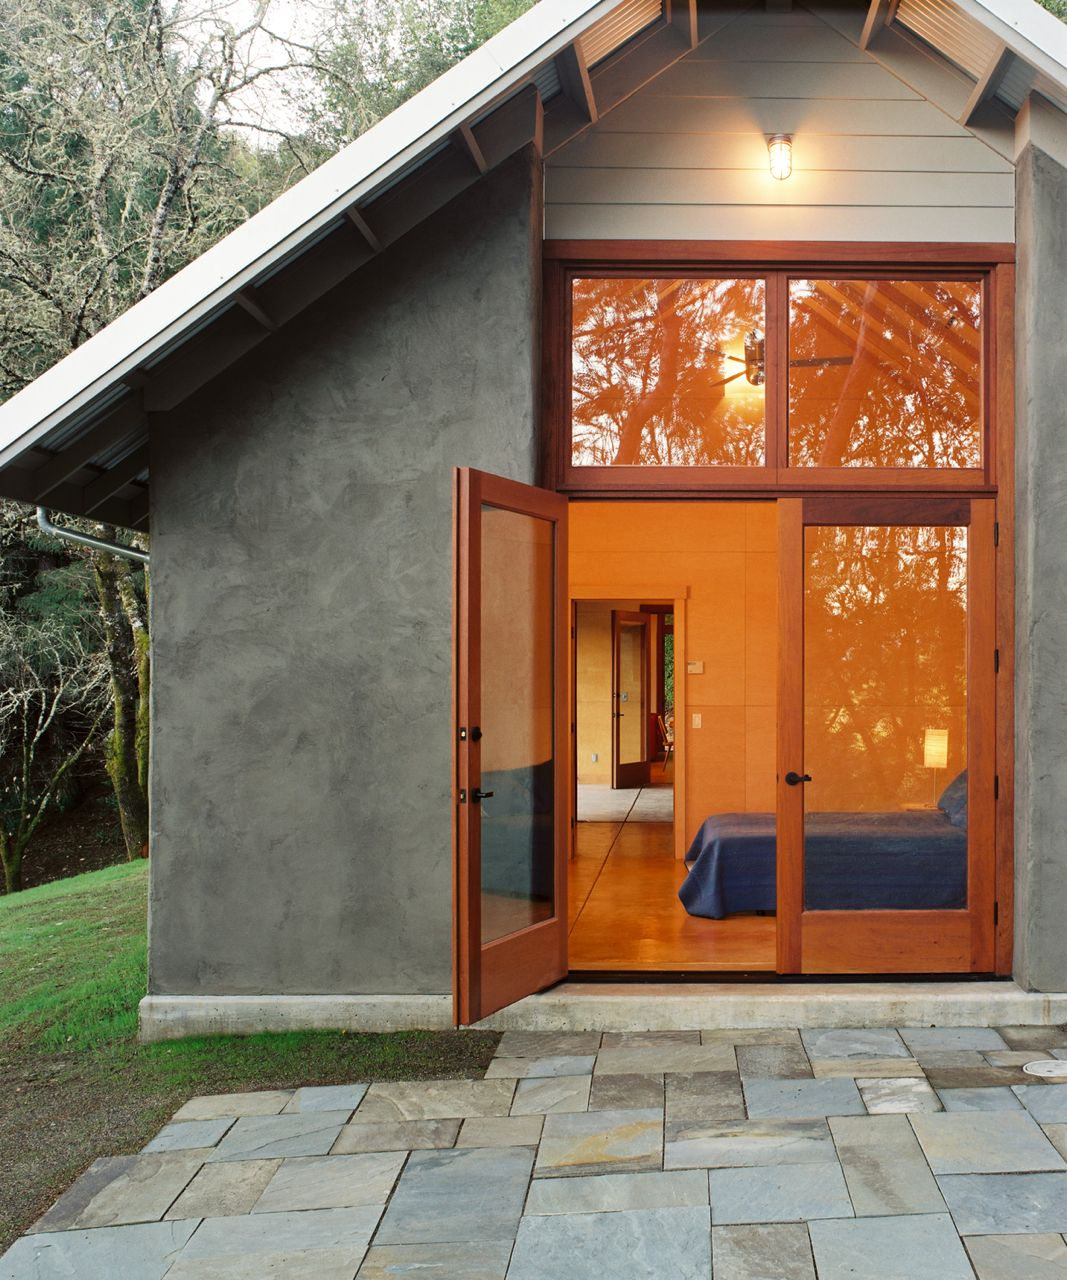 Why Build Strawbale Homes? Energy Efficiency, Visual